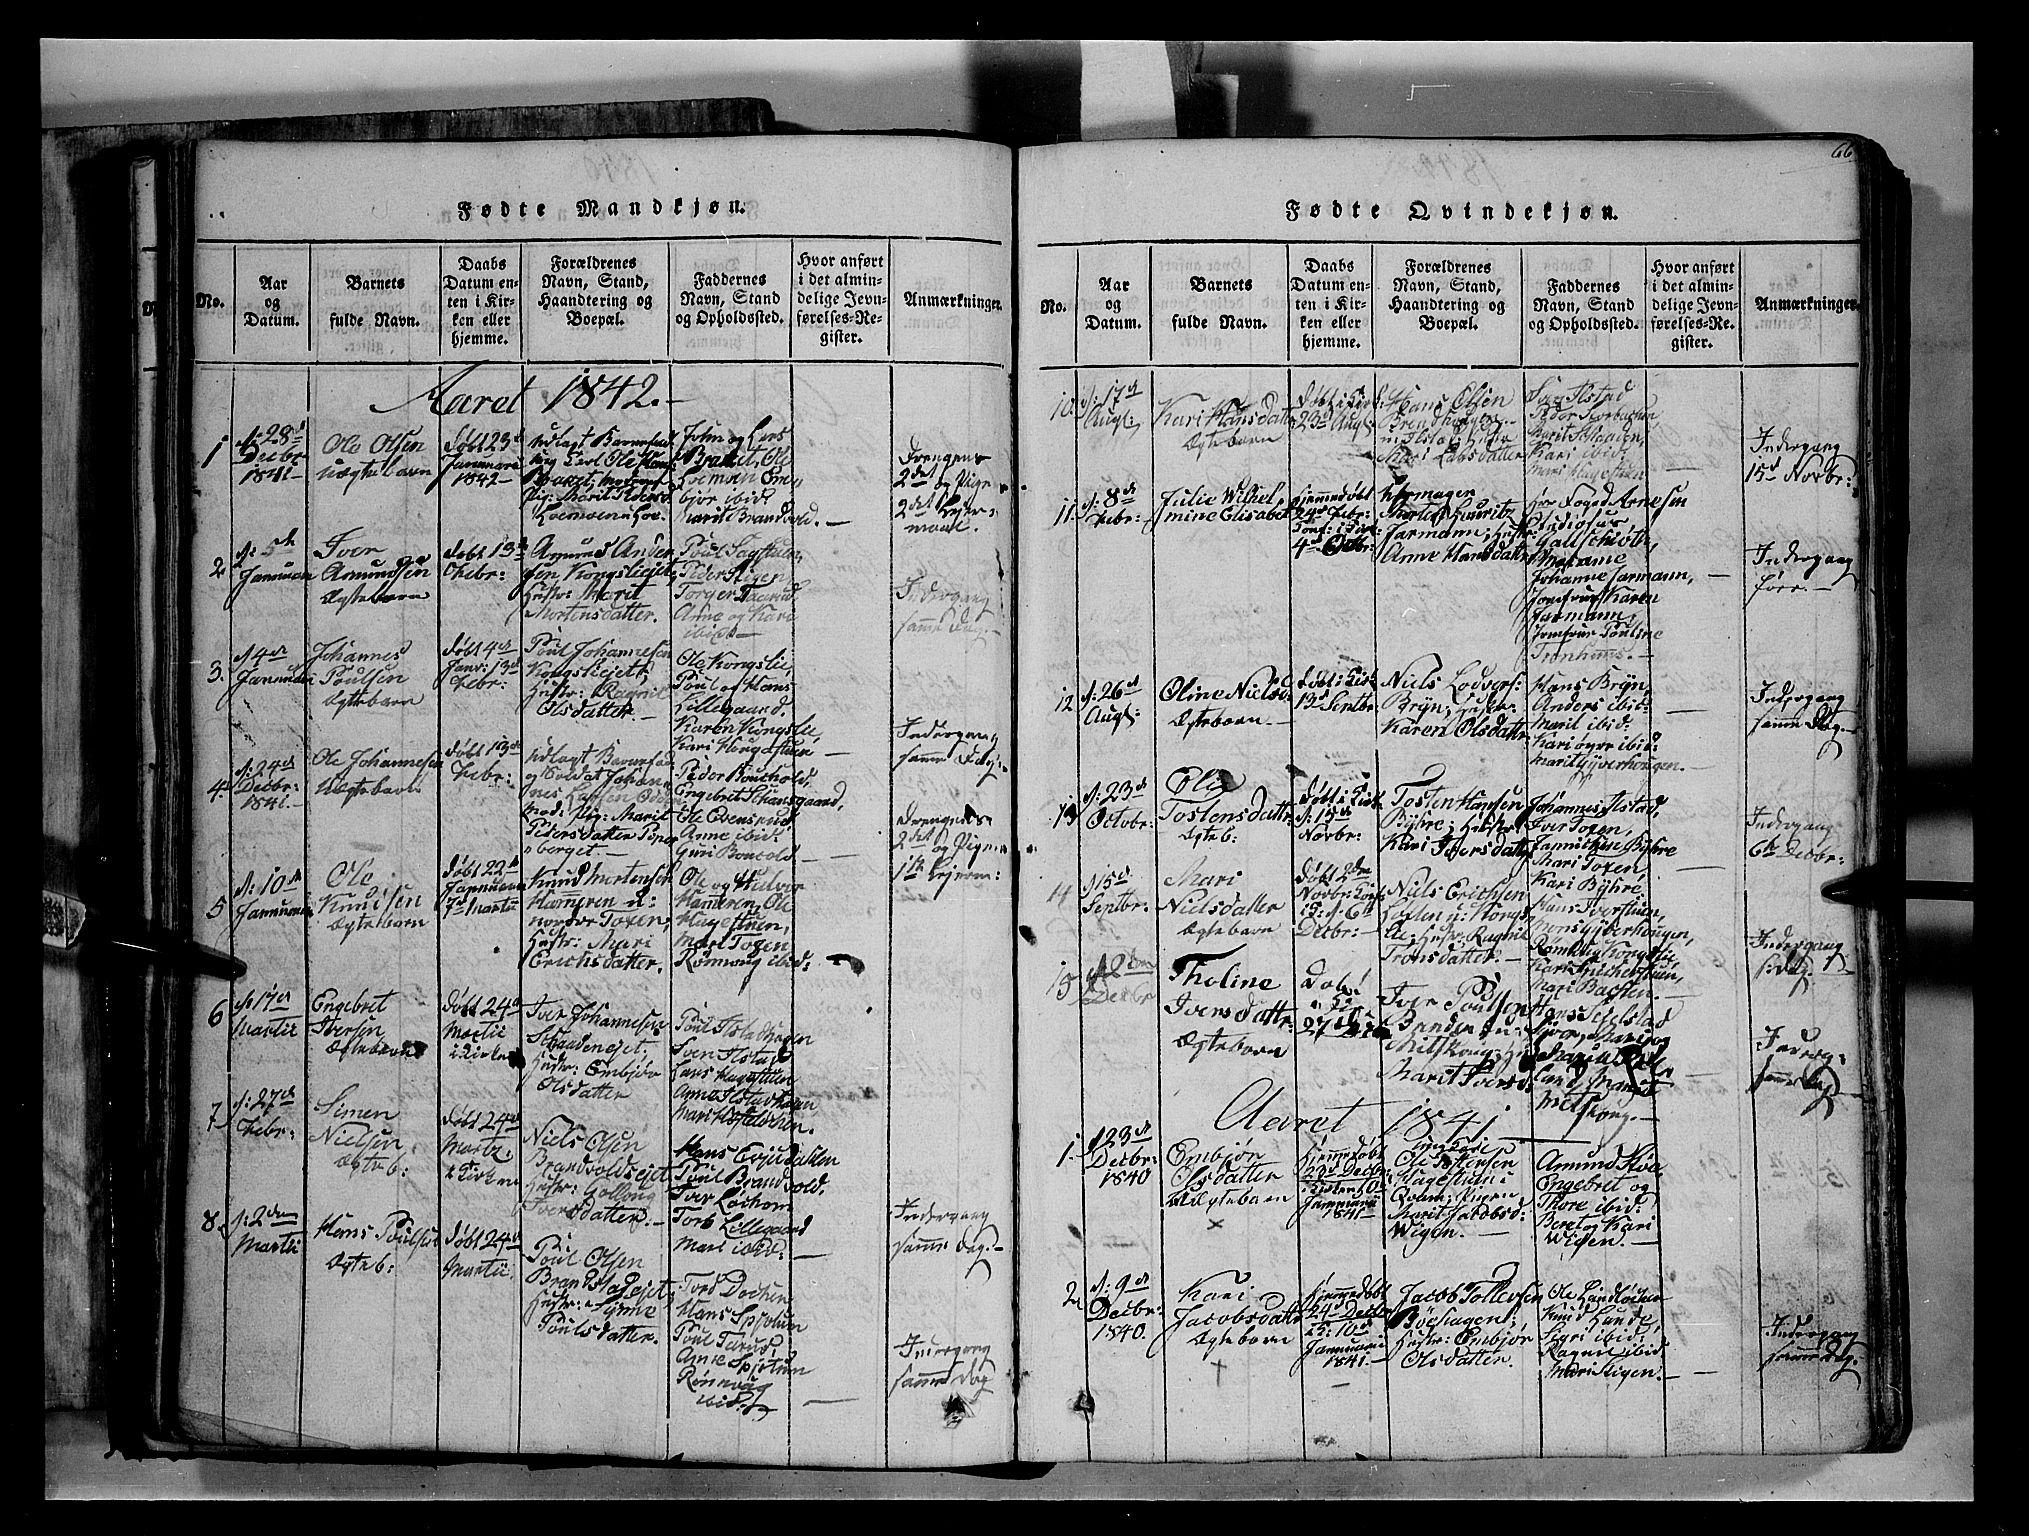 SAH, Fron prestekontor, H/Ha/Hab/L0004: Klokkerbok nr. 4, 1816-1850, s. 66